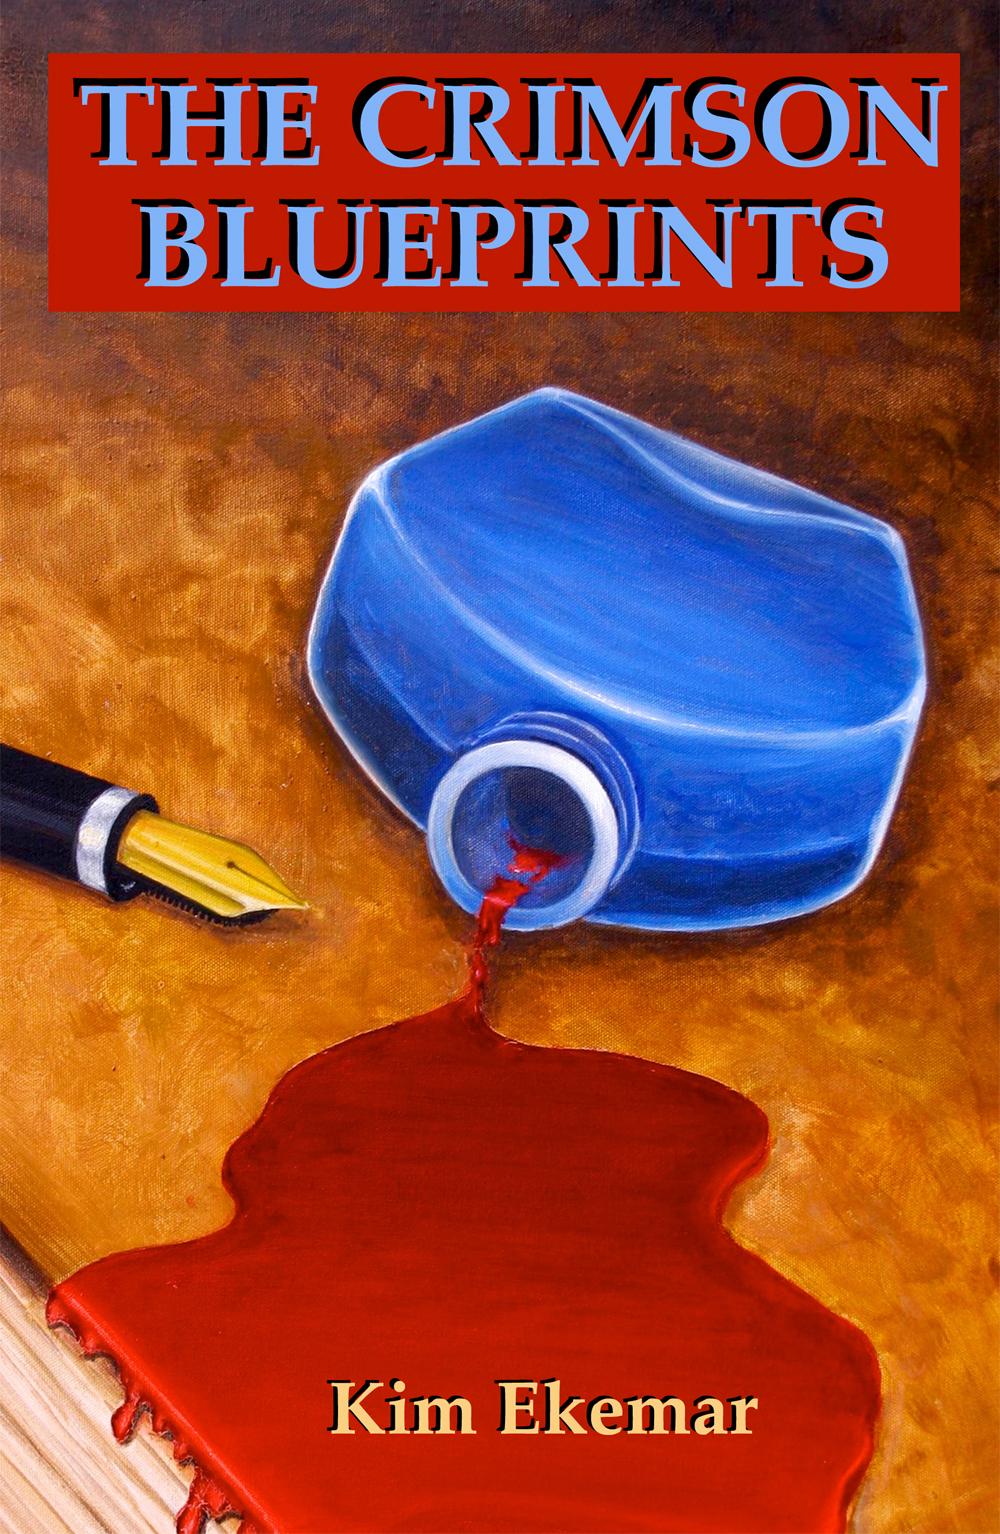 160624 The Crimson Blueprint.jpg